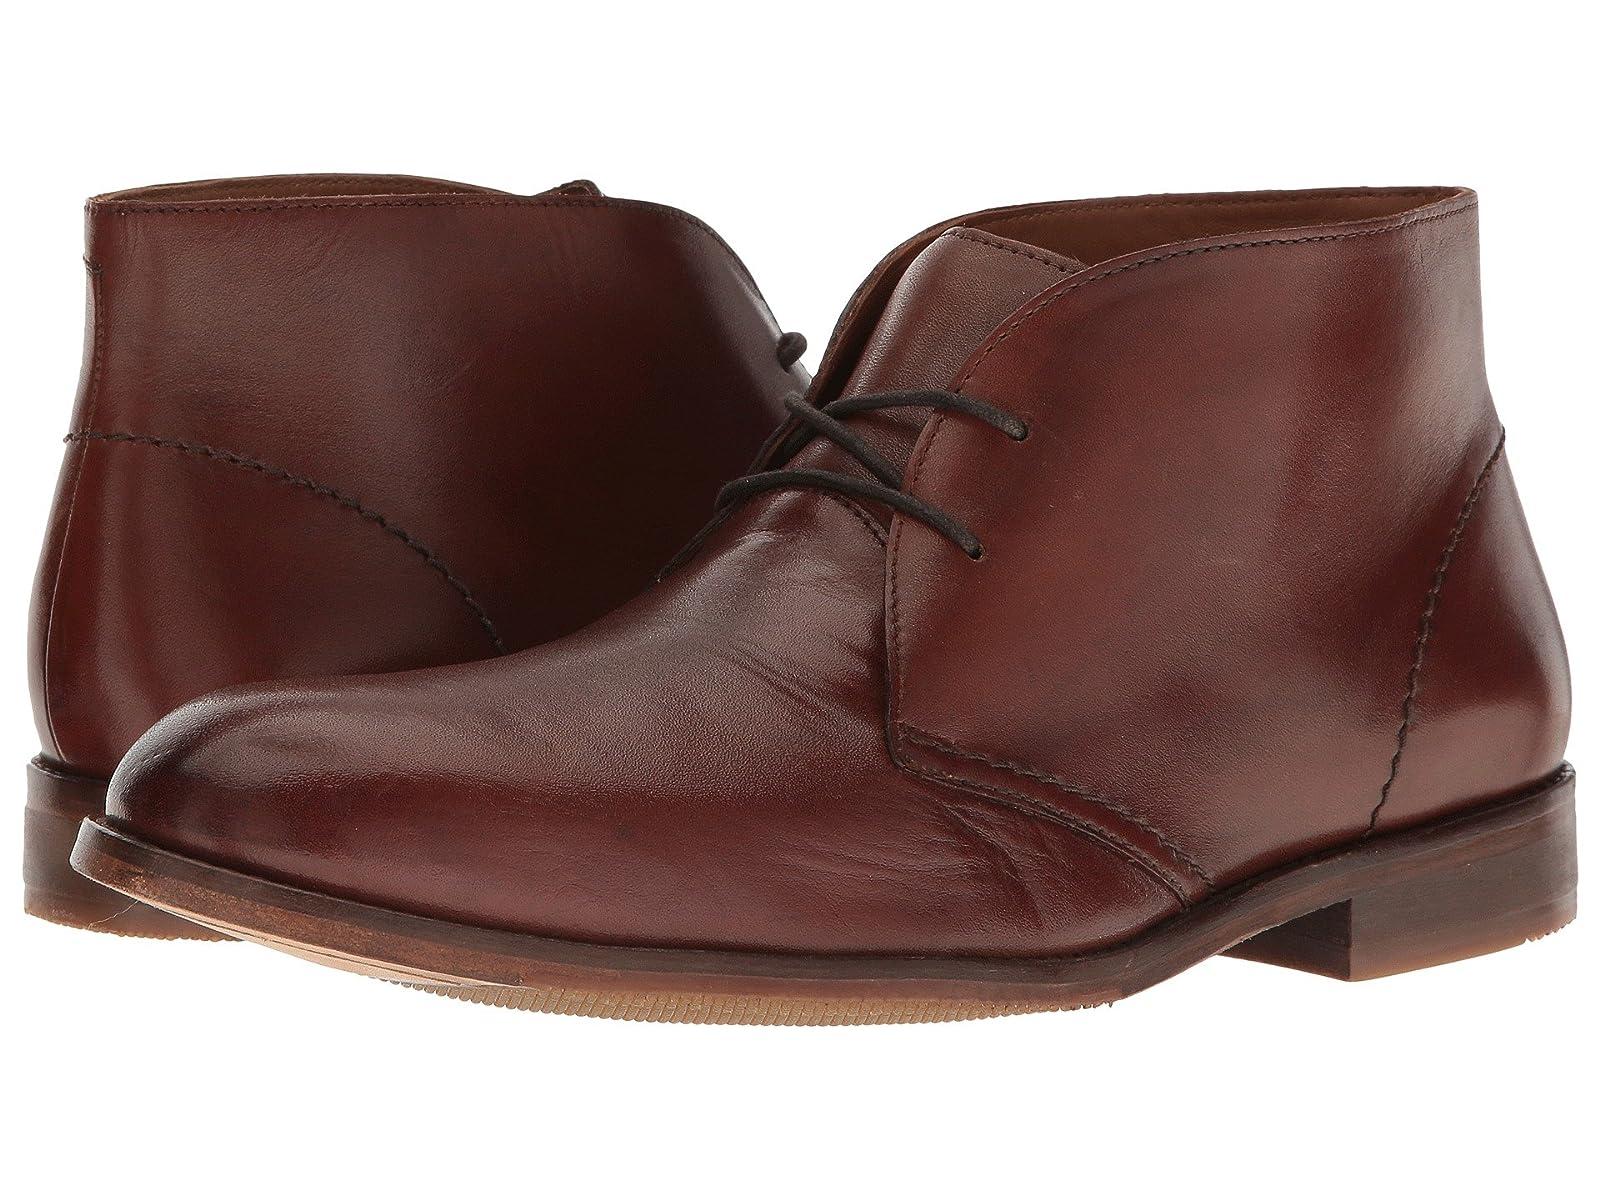 Giorgio Brutini RazorCheap and distinctive eye-catching shoes